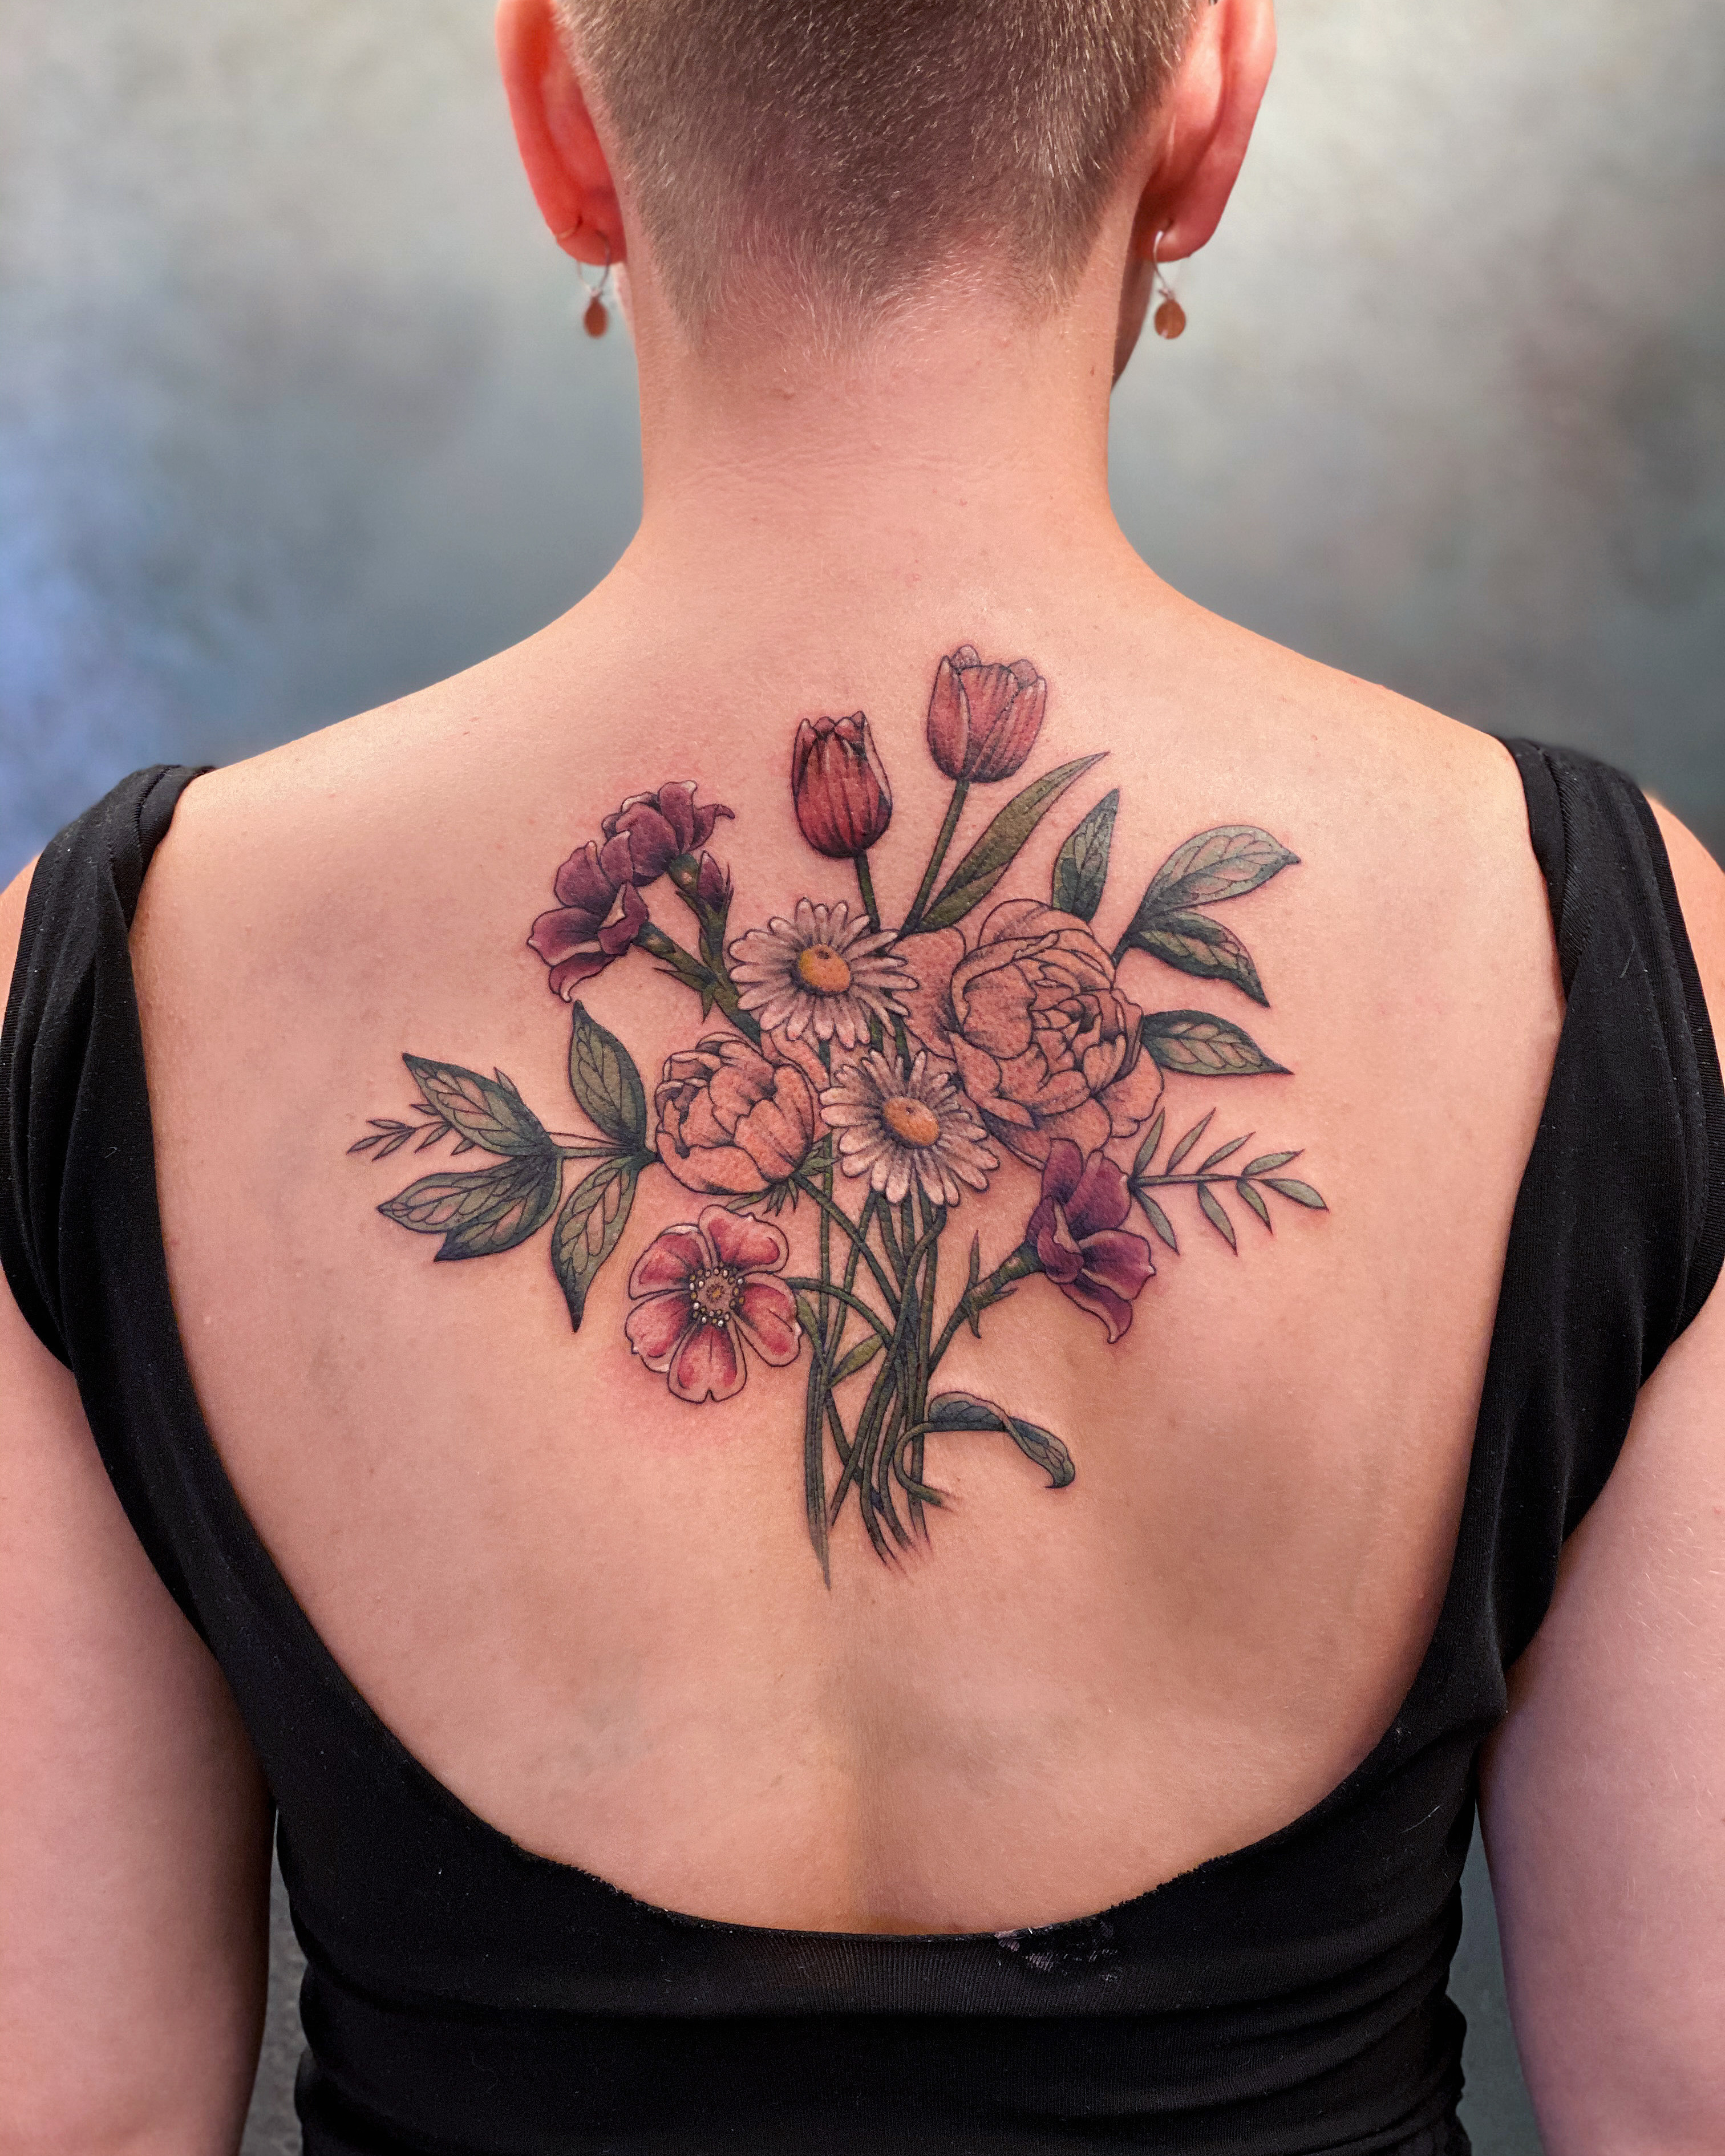 FlowersBack